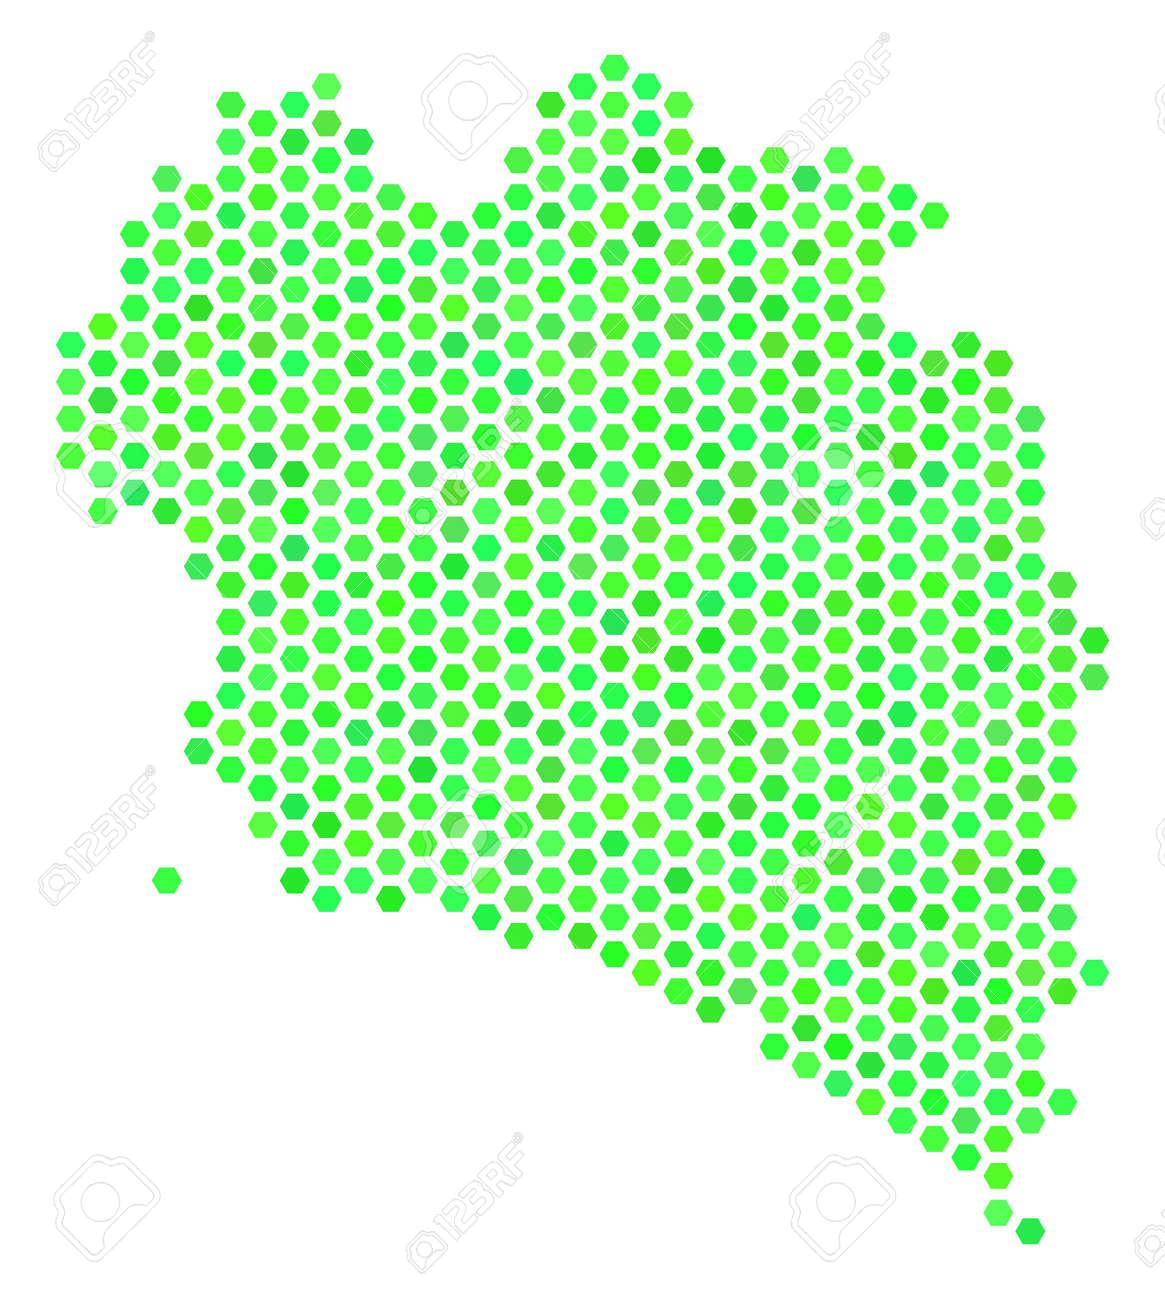 Koh Phangan Thailand Map.Green Koh Phangan Thai Island Map Vector Hexagon Territorial